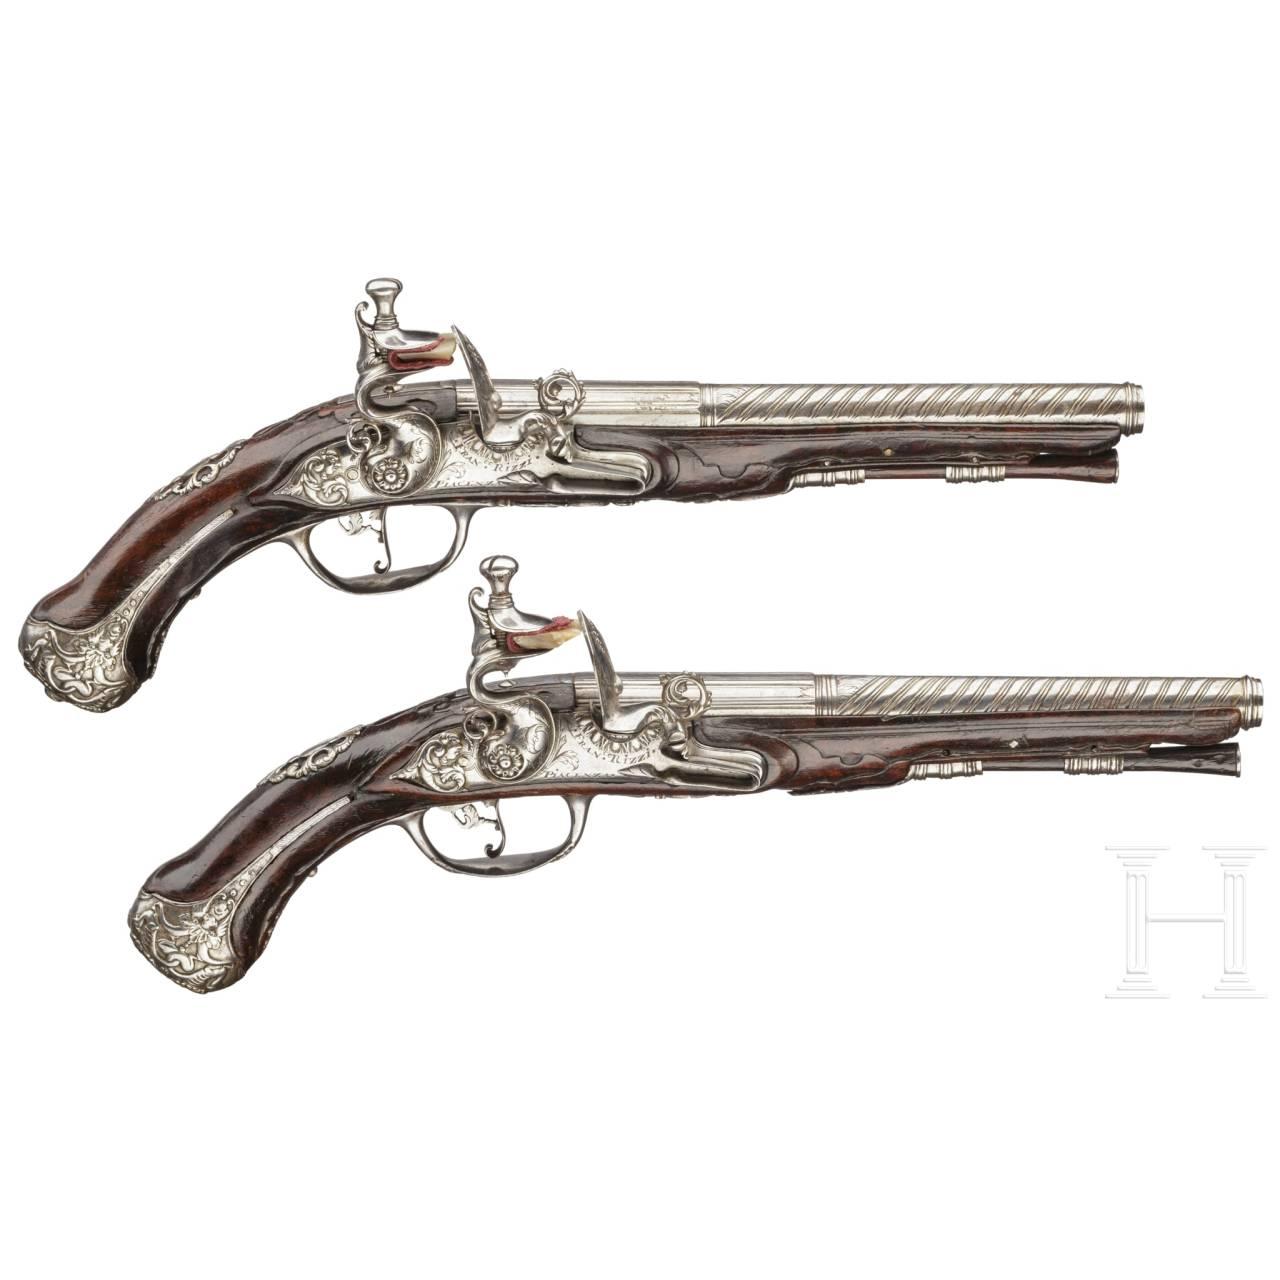 A pair of travelling pistols, Francesco Rizzi in Piacenza, circa 1700